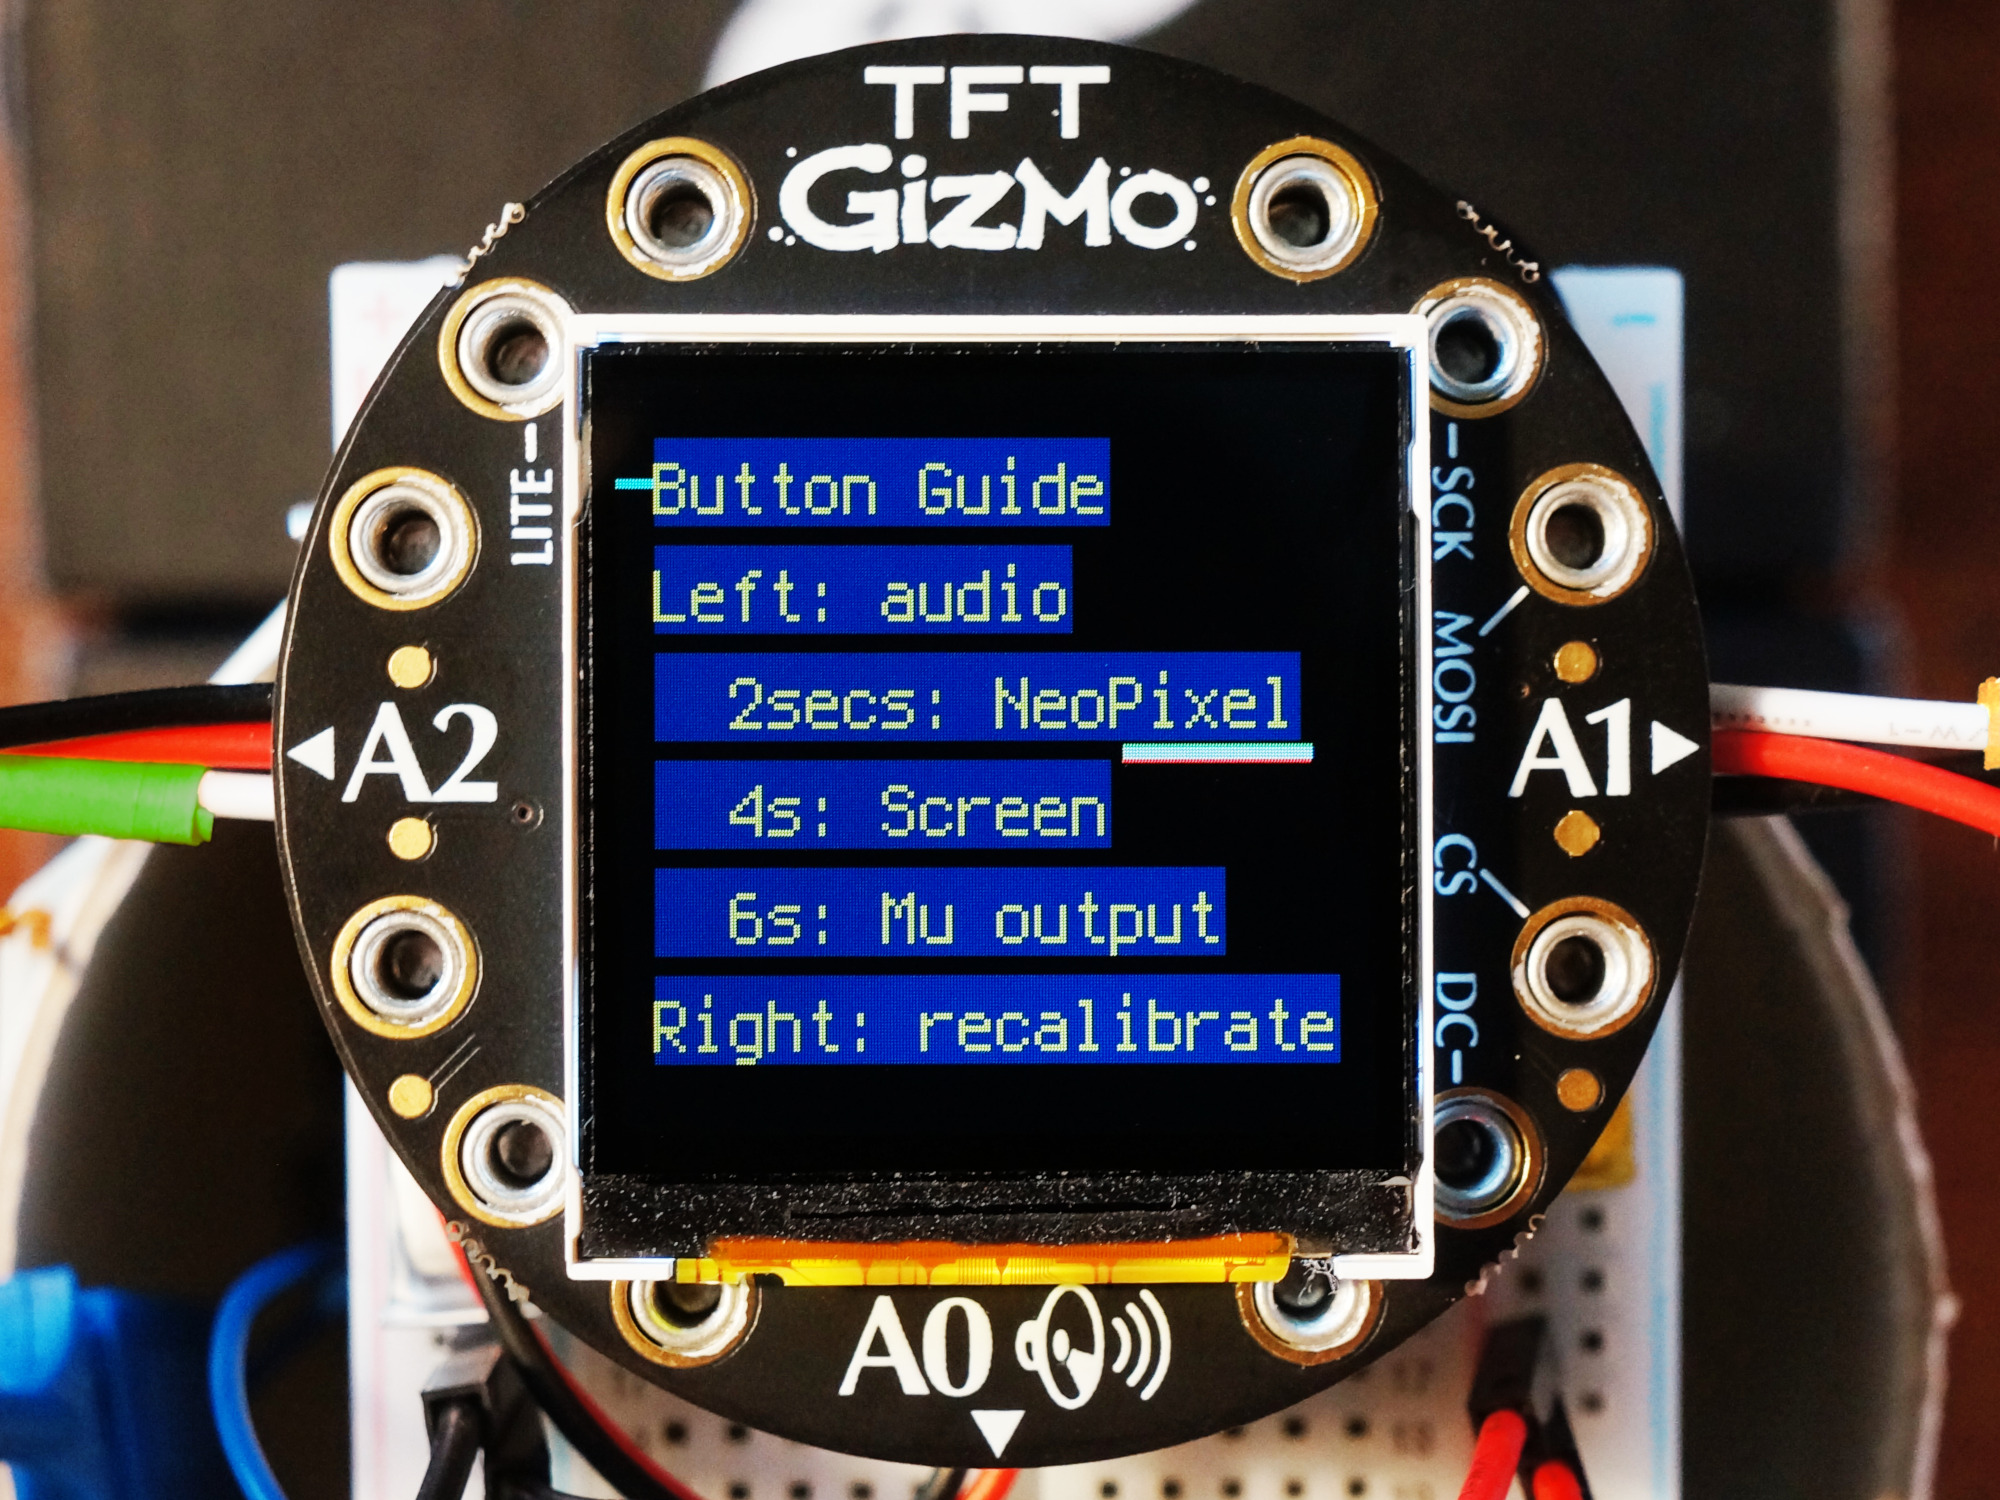 sensors_cpb-gizmo-metal-detector-button-guide-1-colourswap-2000x1500.jpg